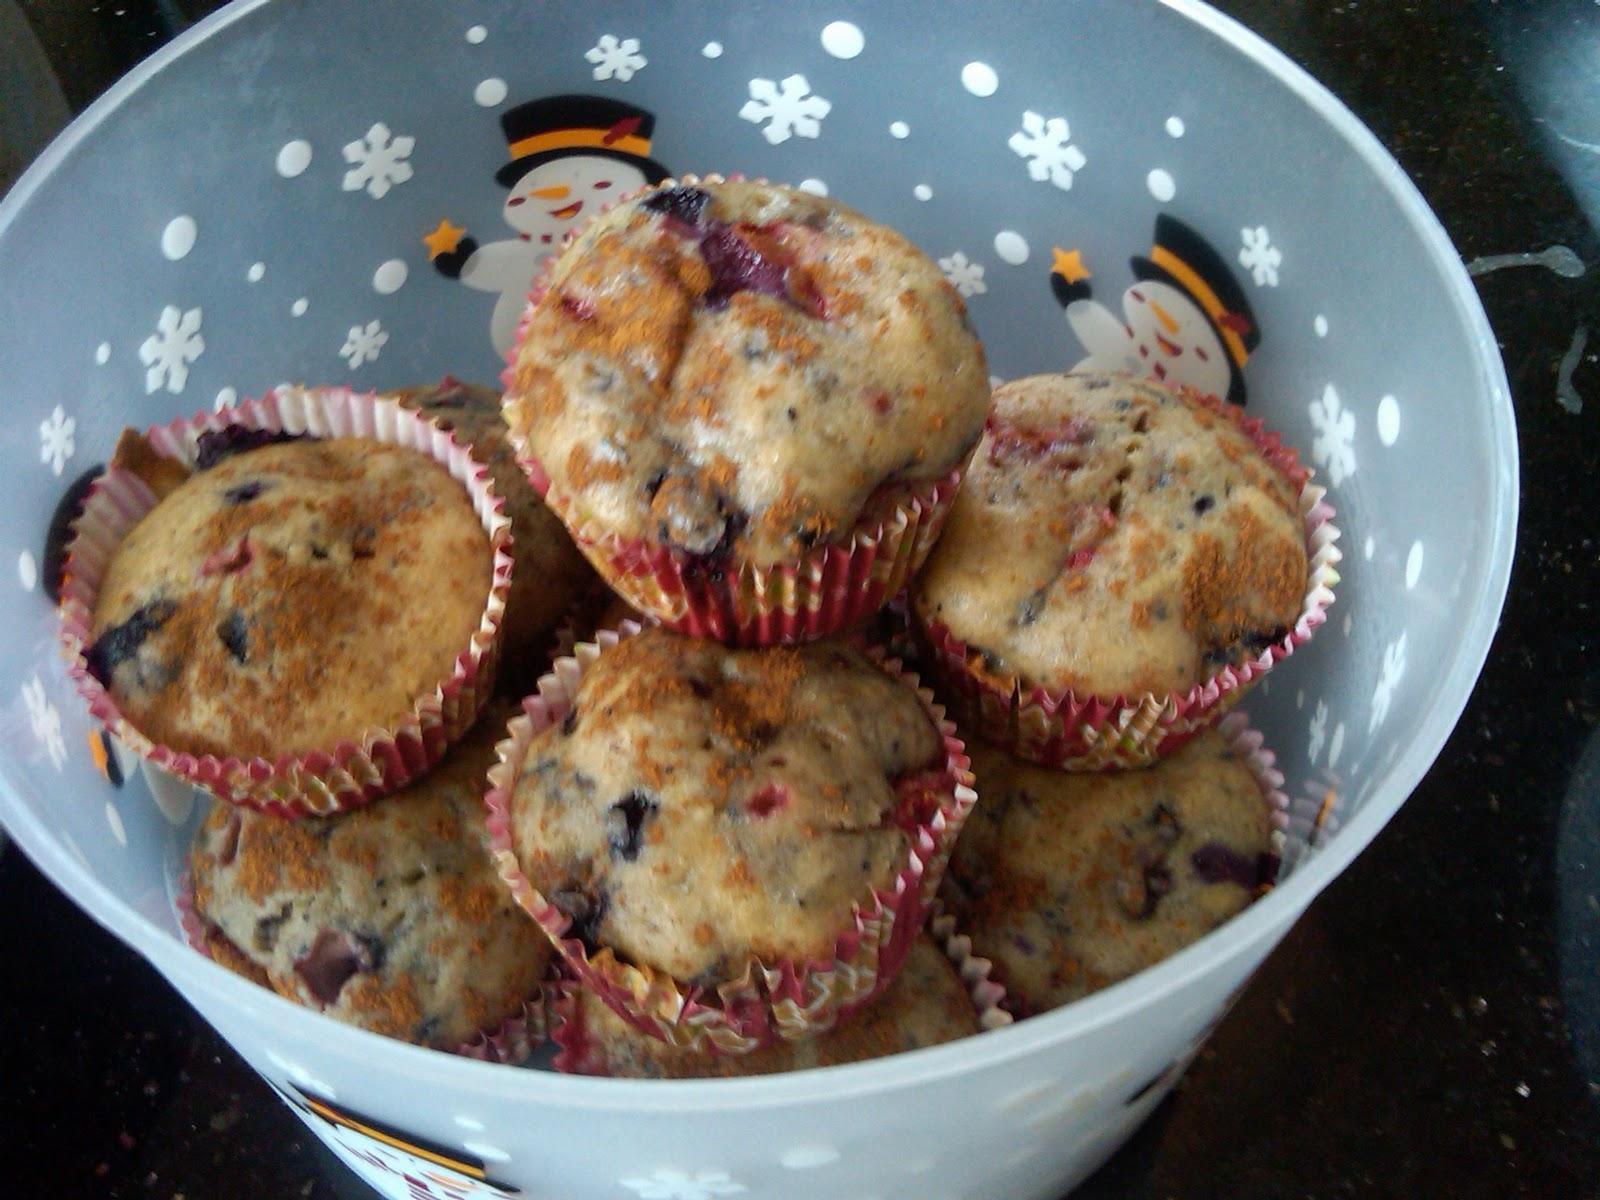 Theresa+Mixed+Berry+Whole+Wheat+Muffins.jpg